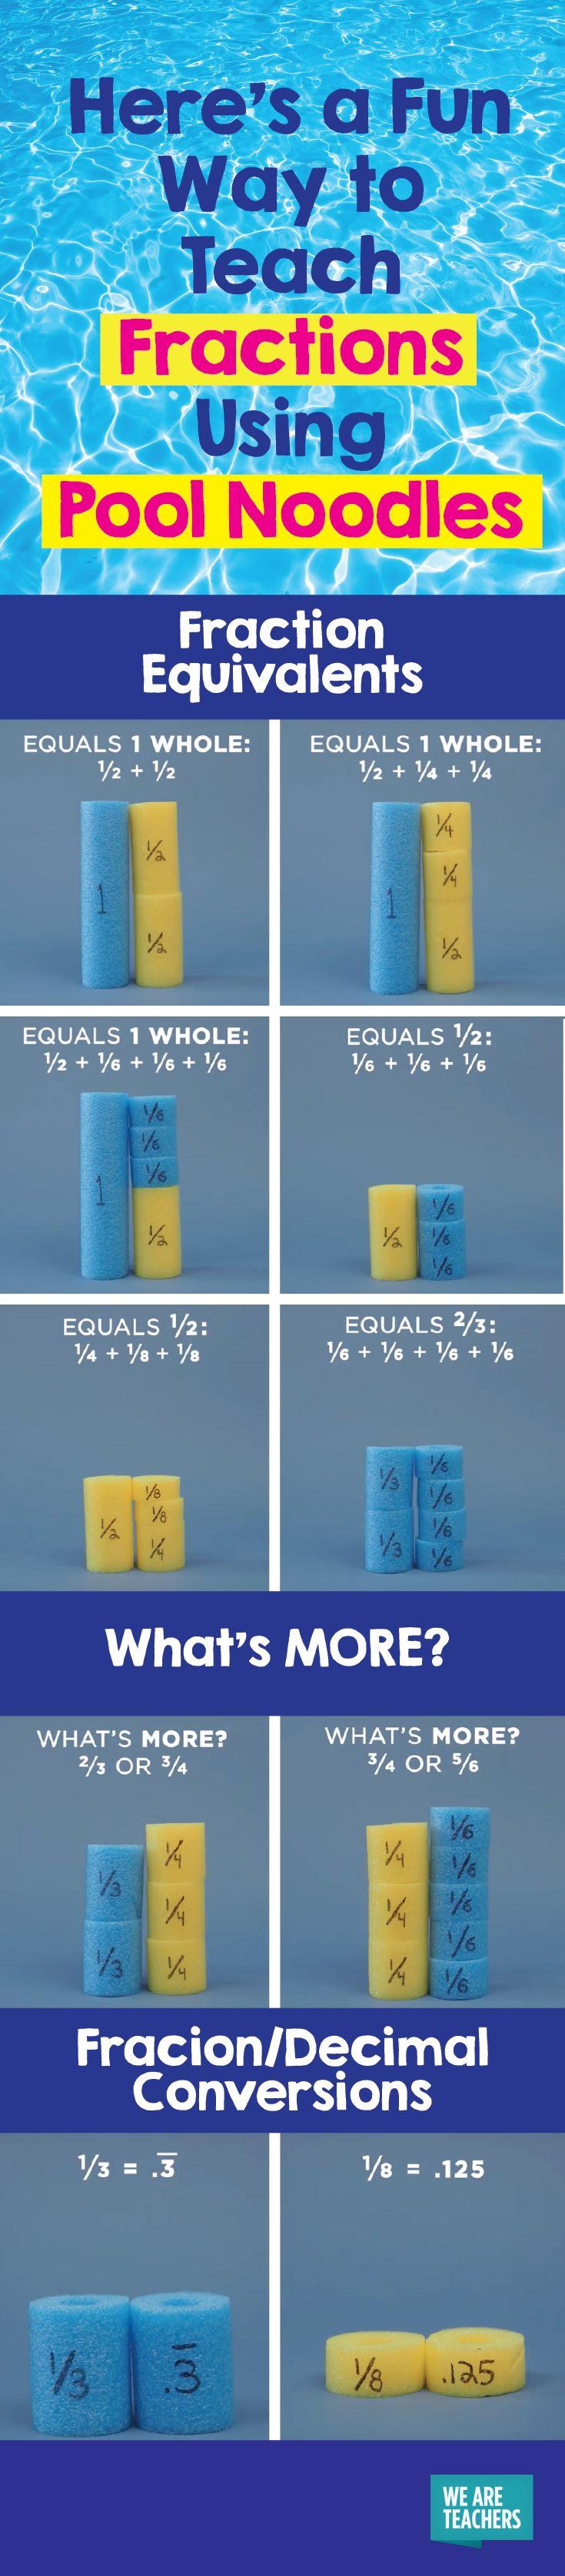 Here's a Fun Way to Teach Fractions Using Pool Noodles - WeAreTeachers